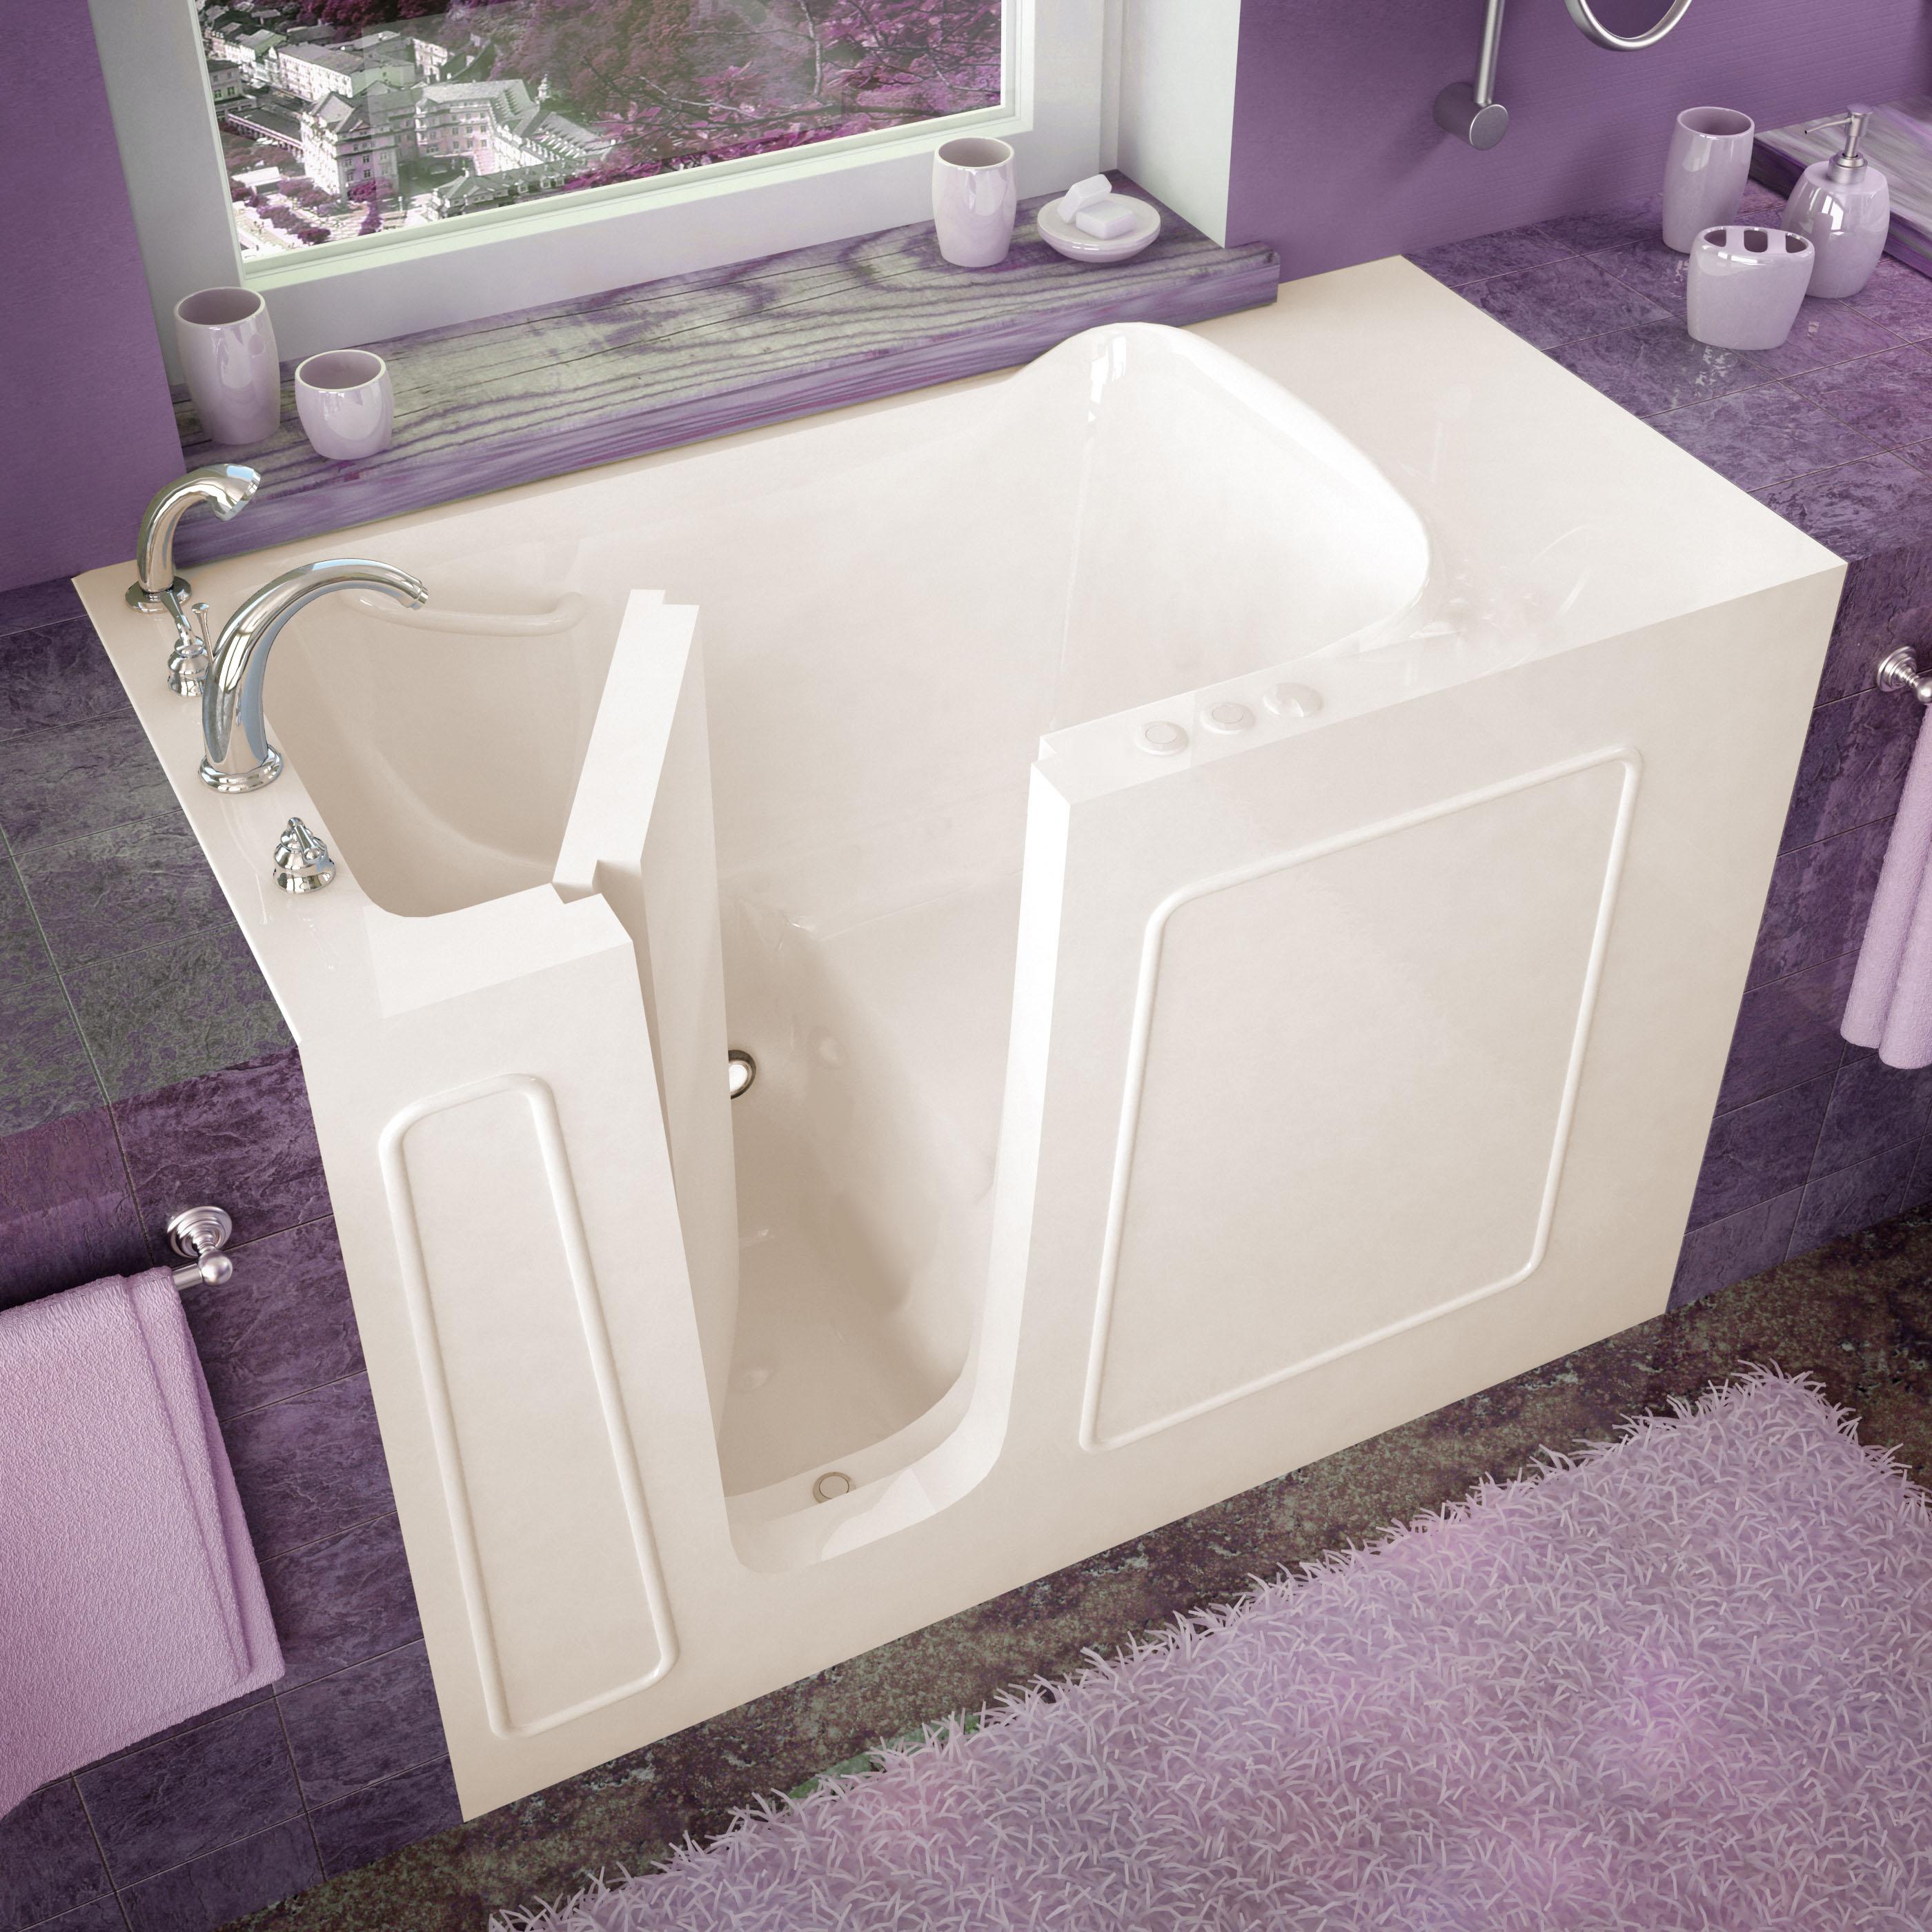 26x53 Left Drain Biscuit Soaking Walk-In Bathtub